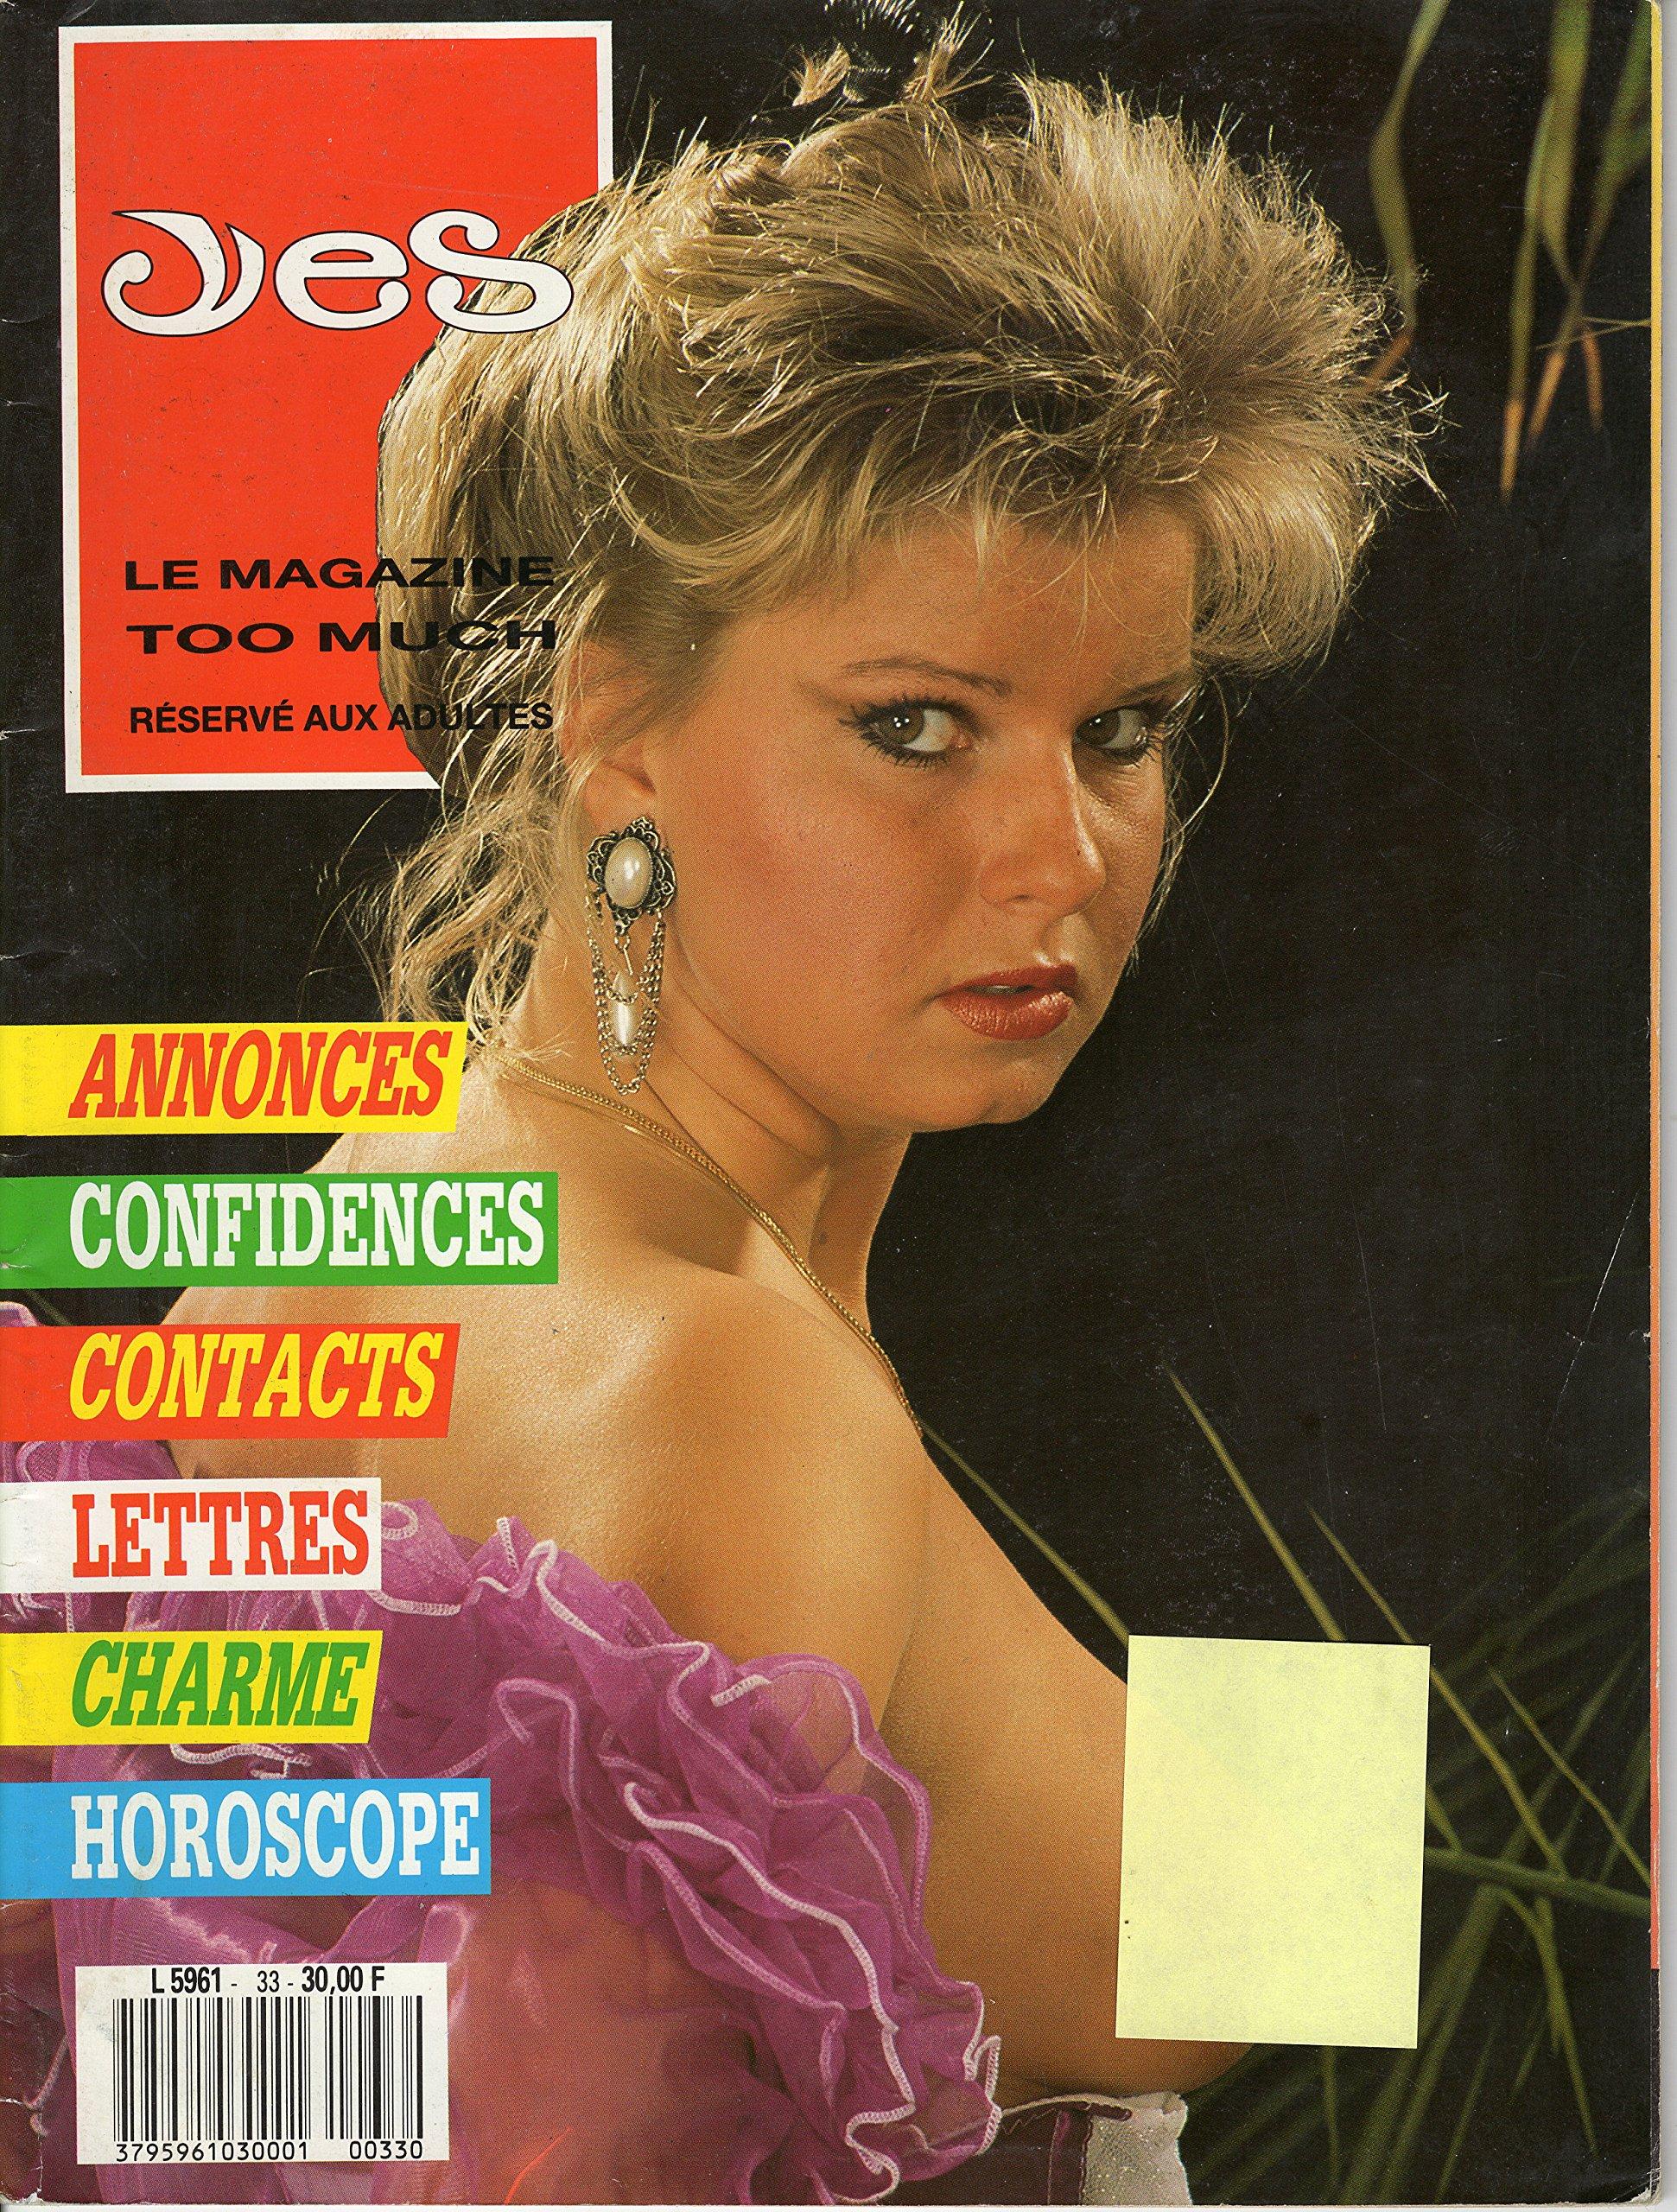 Amazon.com: Yes - le magazine too much 1989 RARE KELI ...